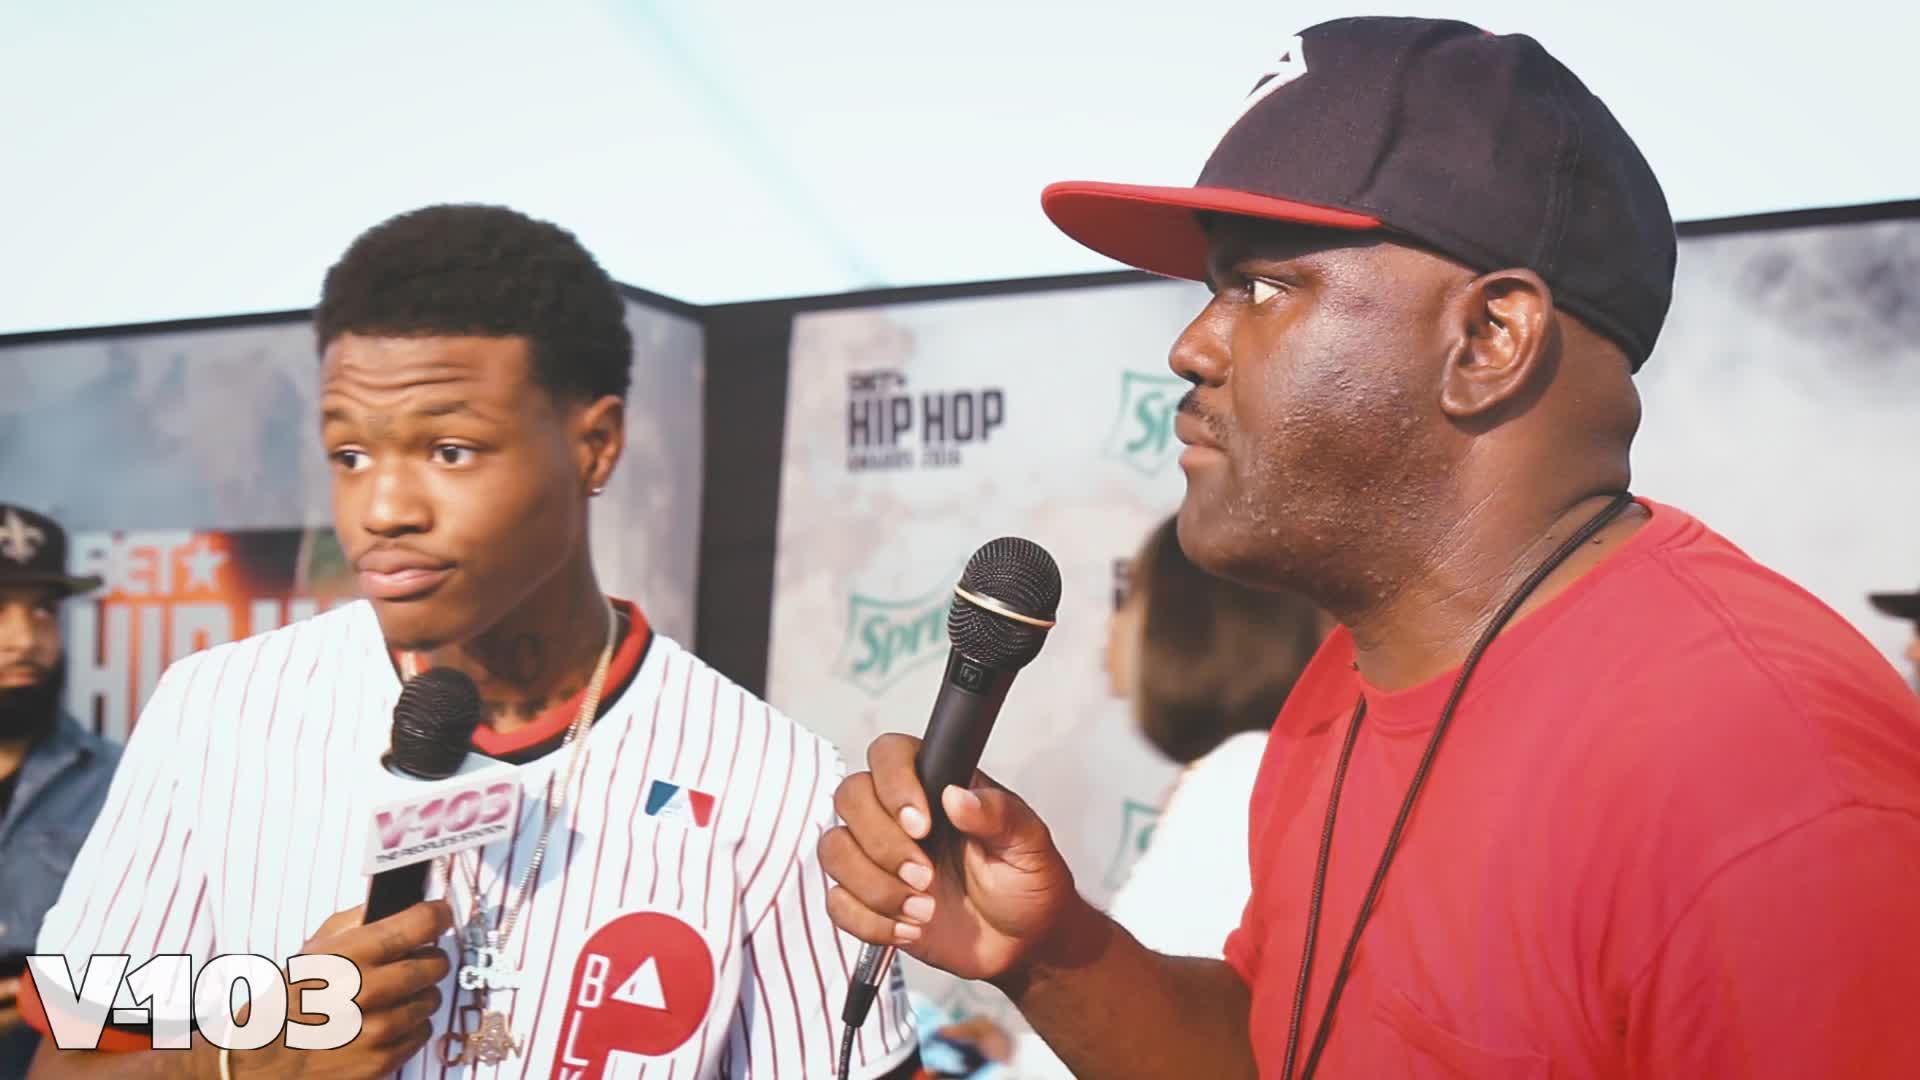 DC Young Fly w Greg Street 2016 BET Hip Hop Awards Green 1920x1080